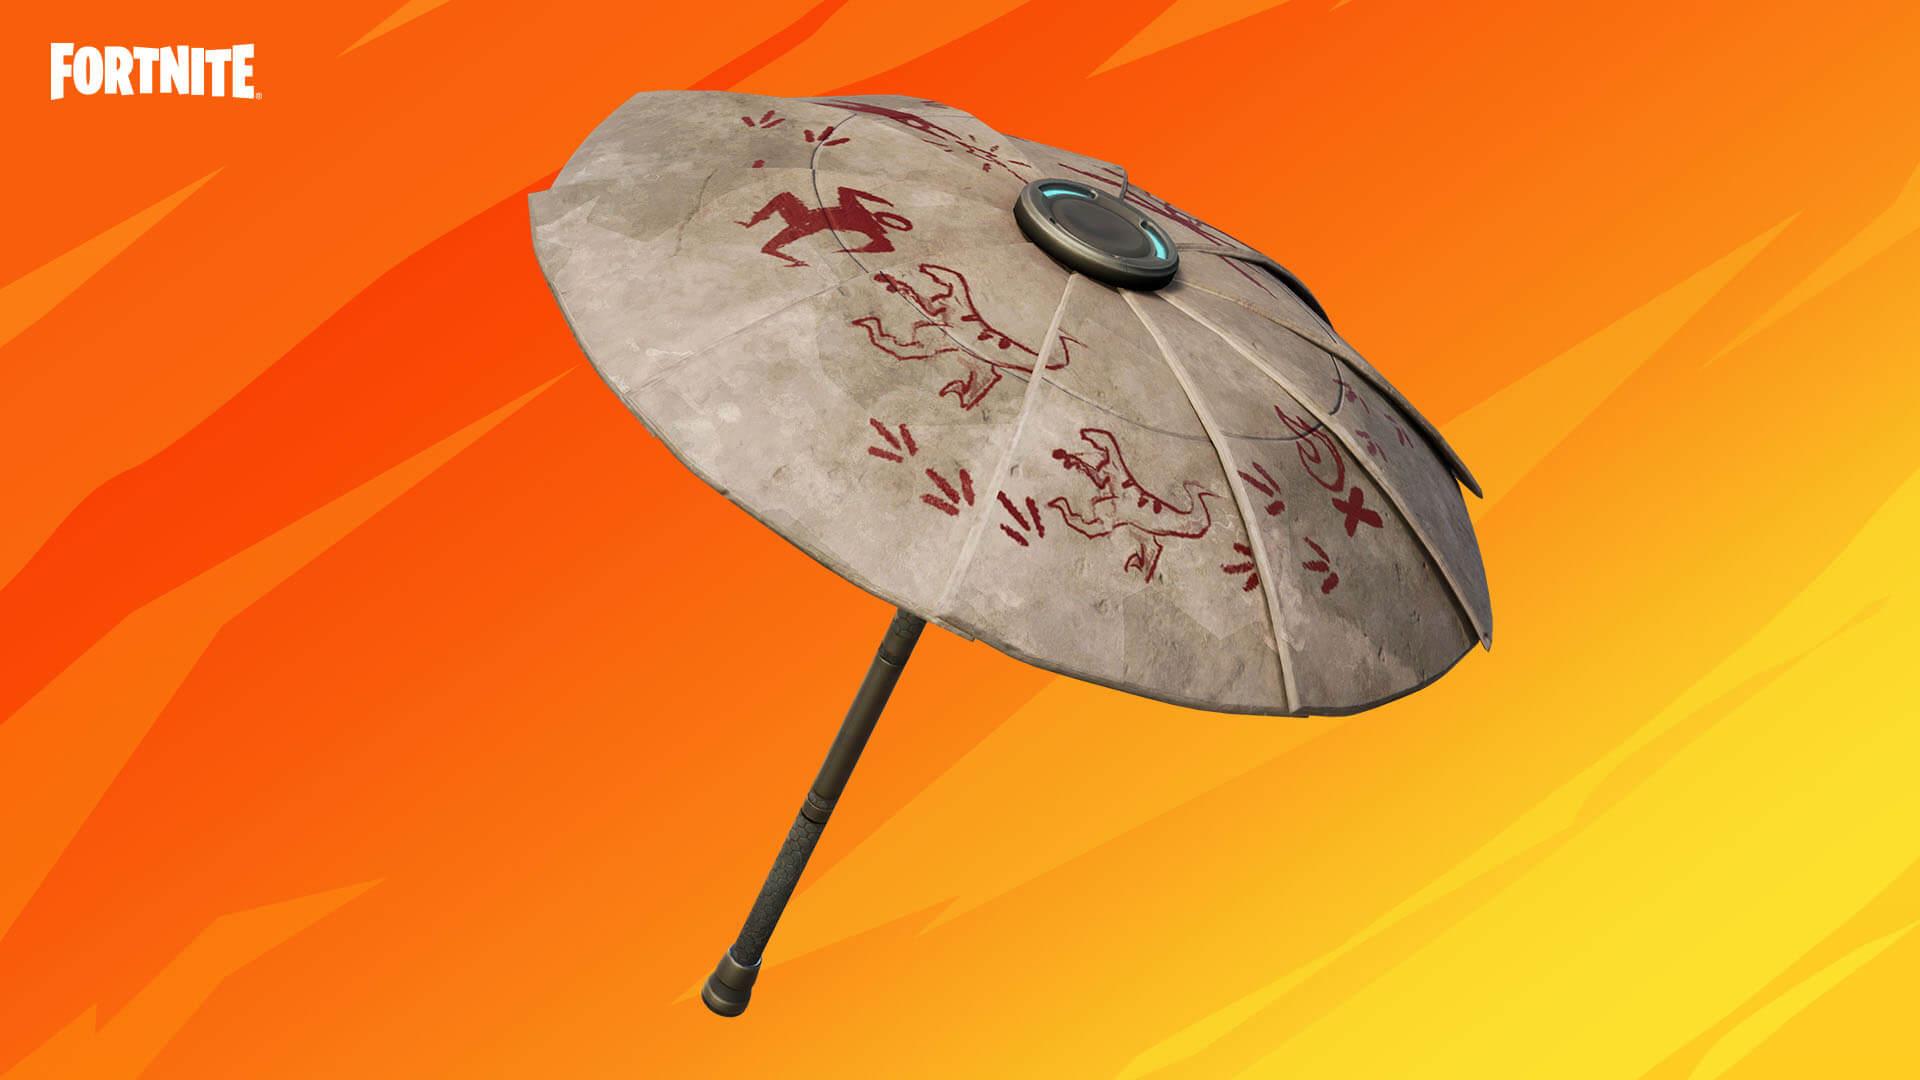 Fortnite Escapist Umbrella